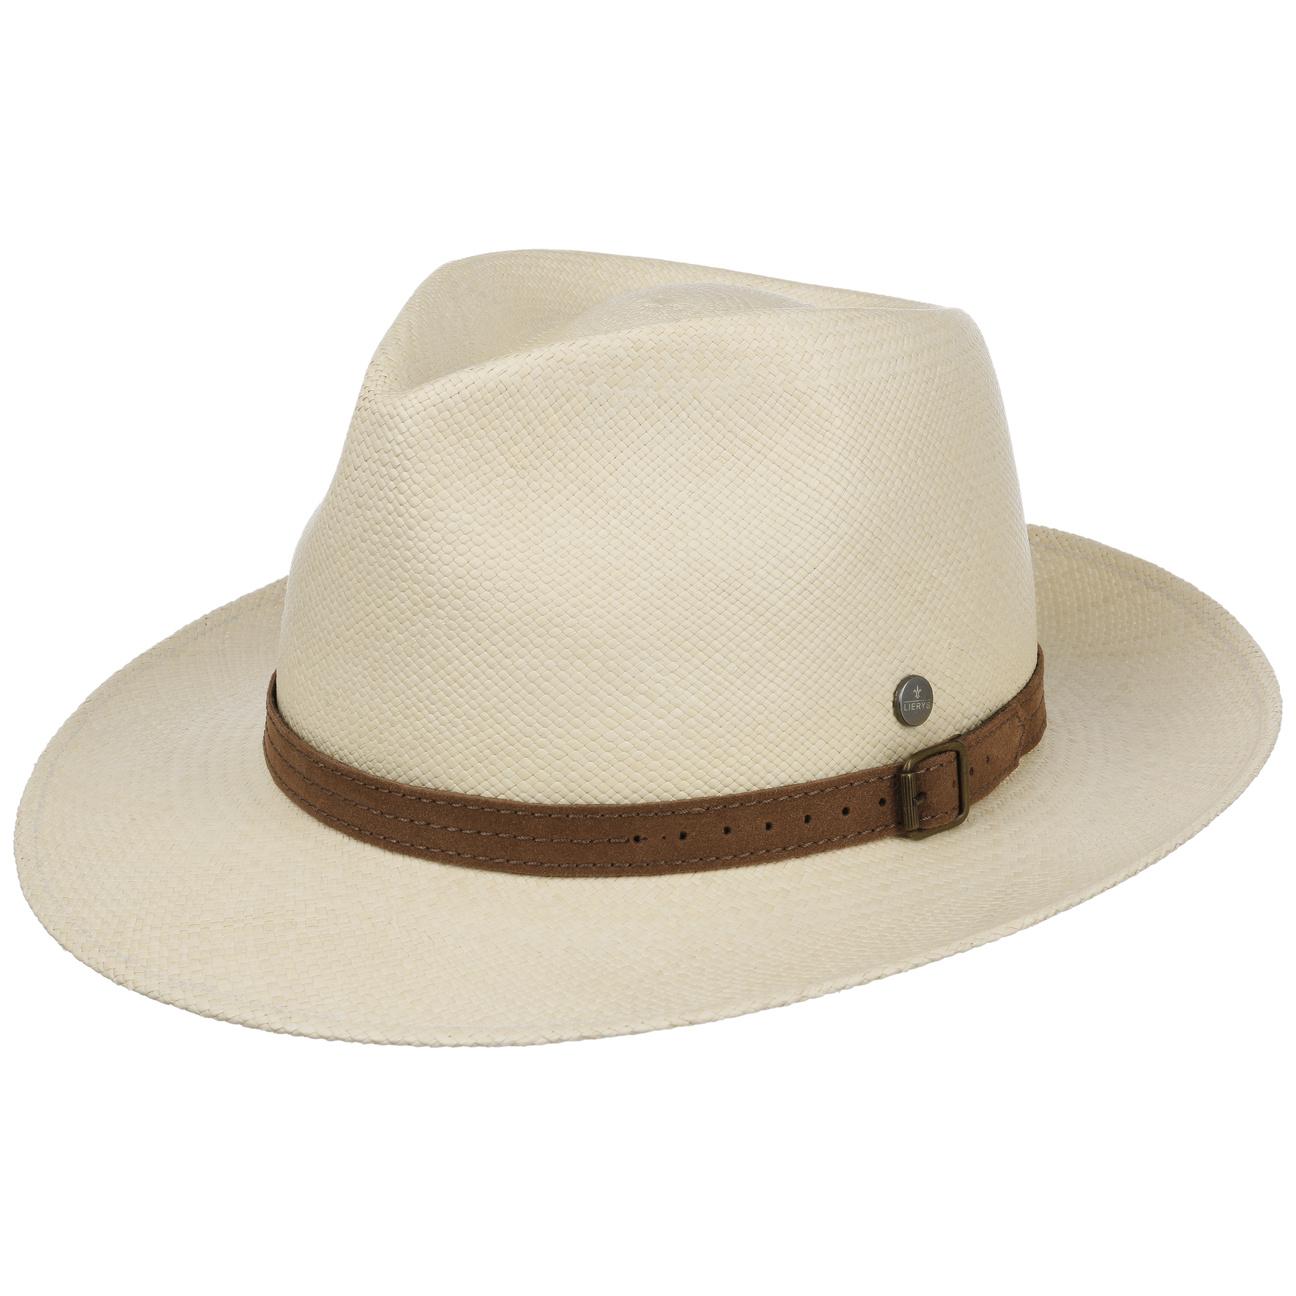 Chapeau Rustic en Paille Panama by Lierys  chapeau en paille